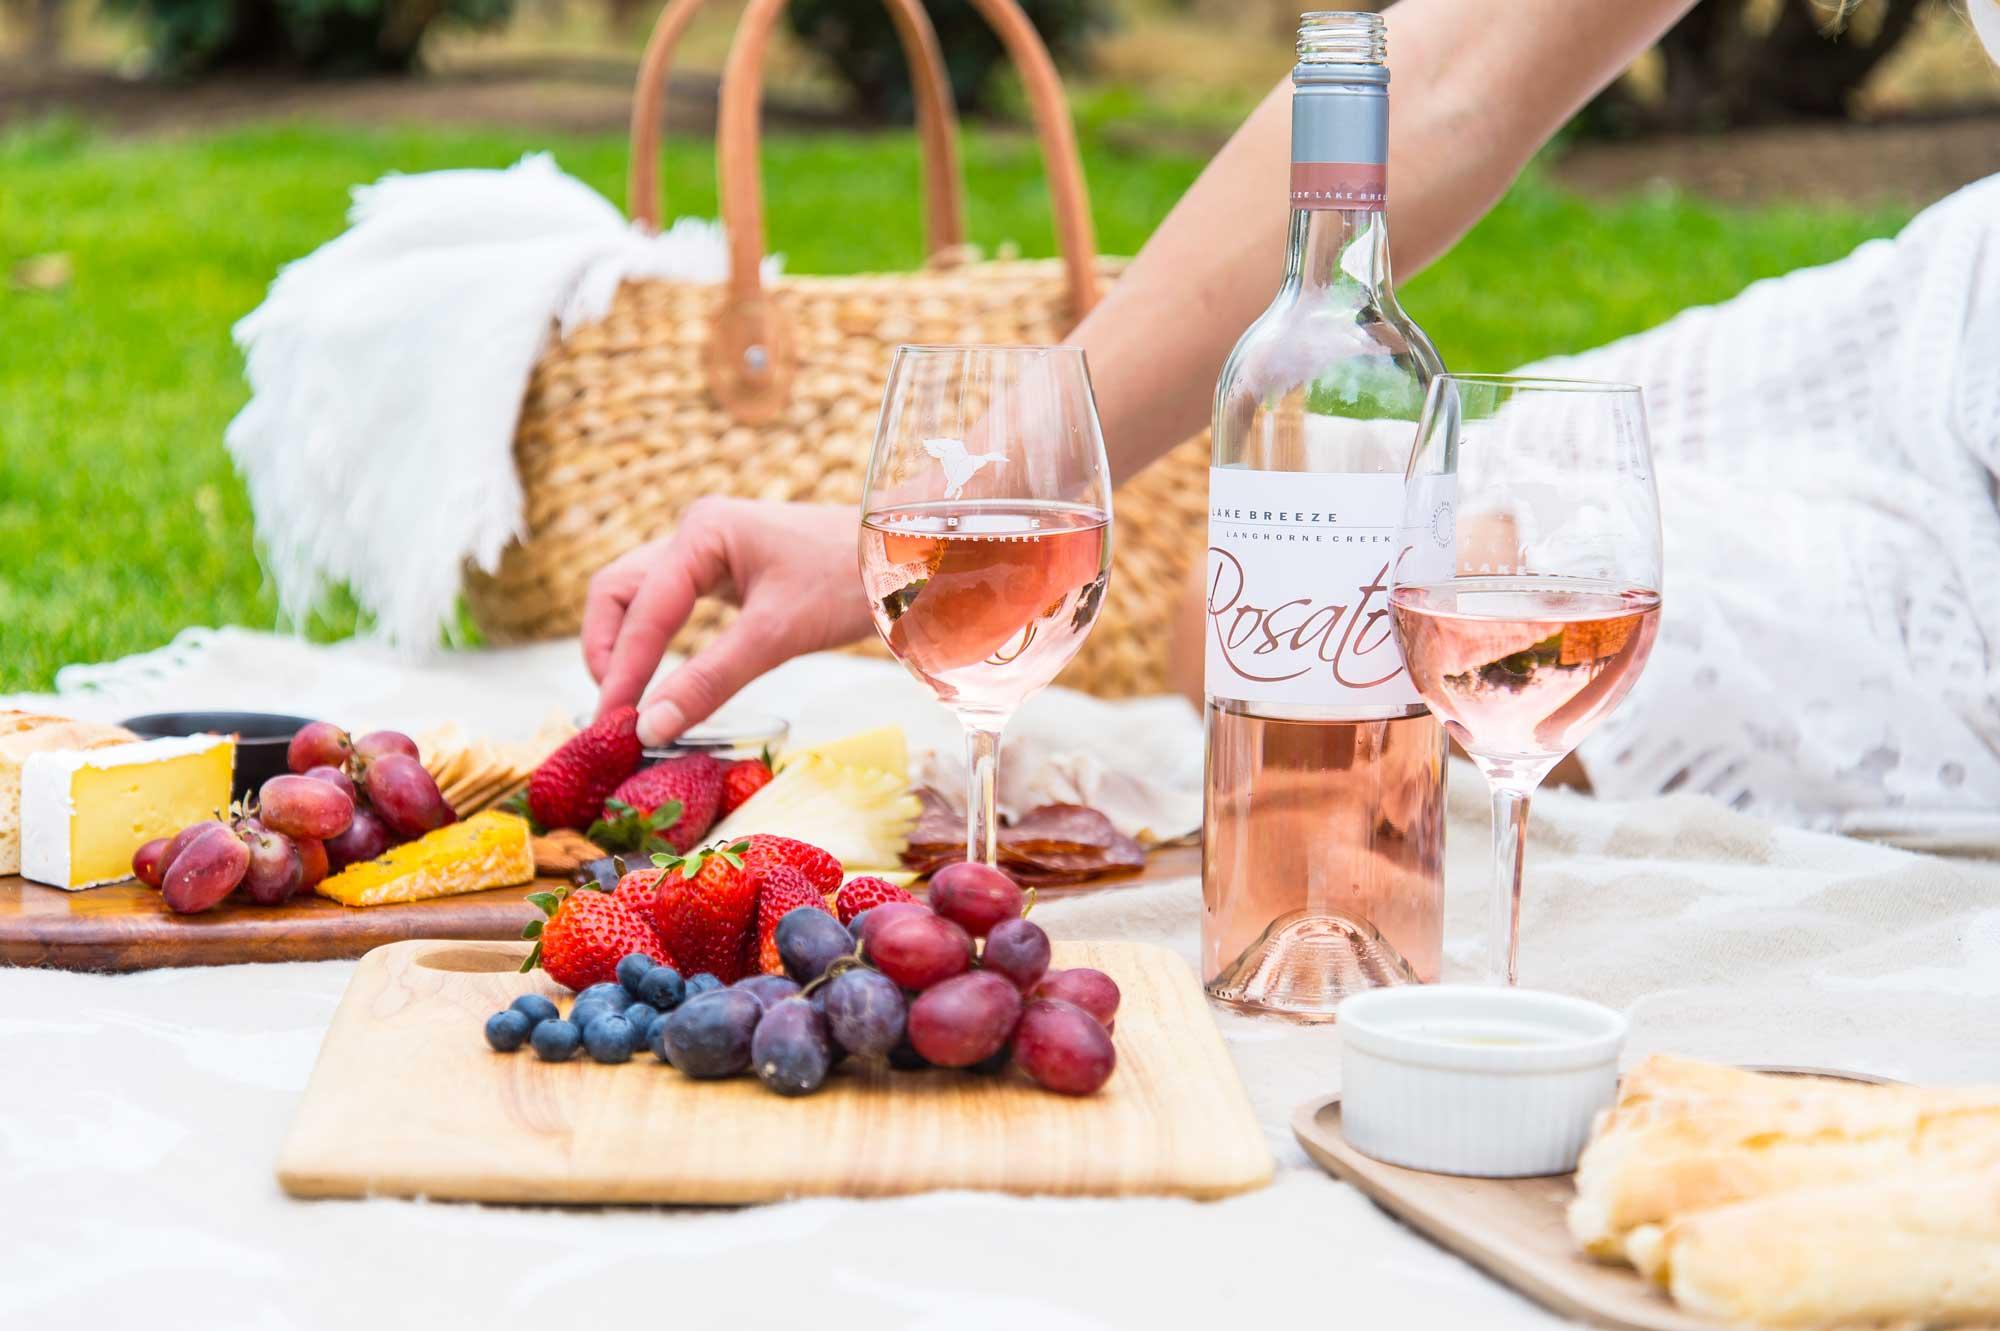 Lake-Breeze-Wines-Picnic-Rose-Rosato-and-Fruit-Platter.jpg